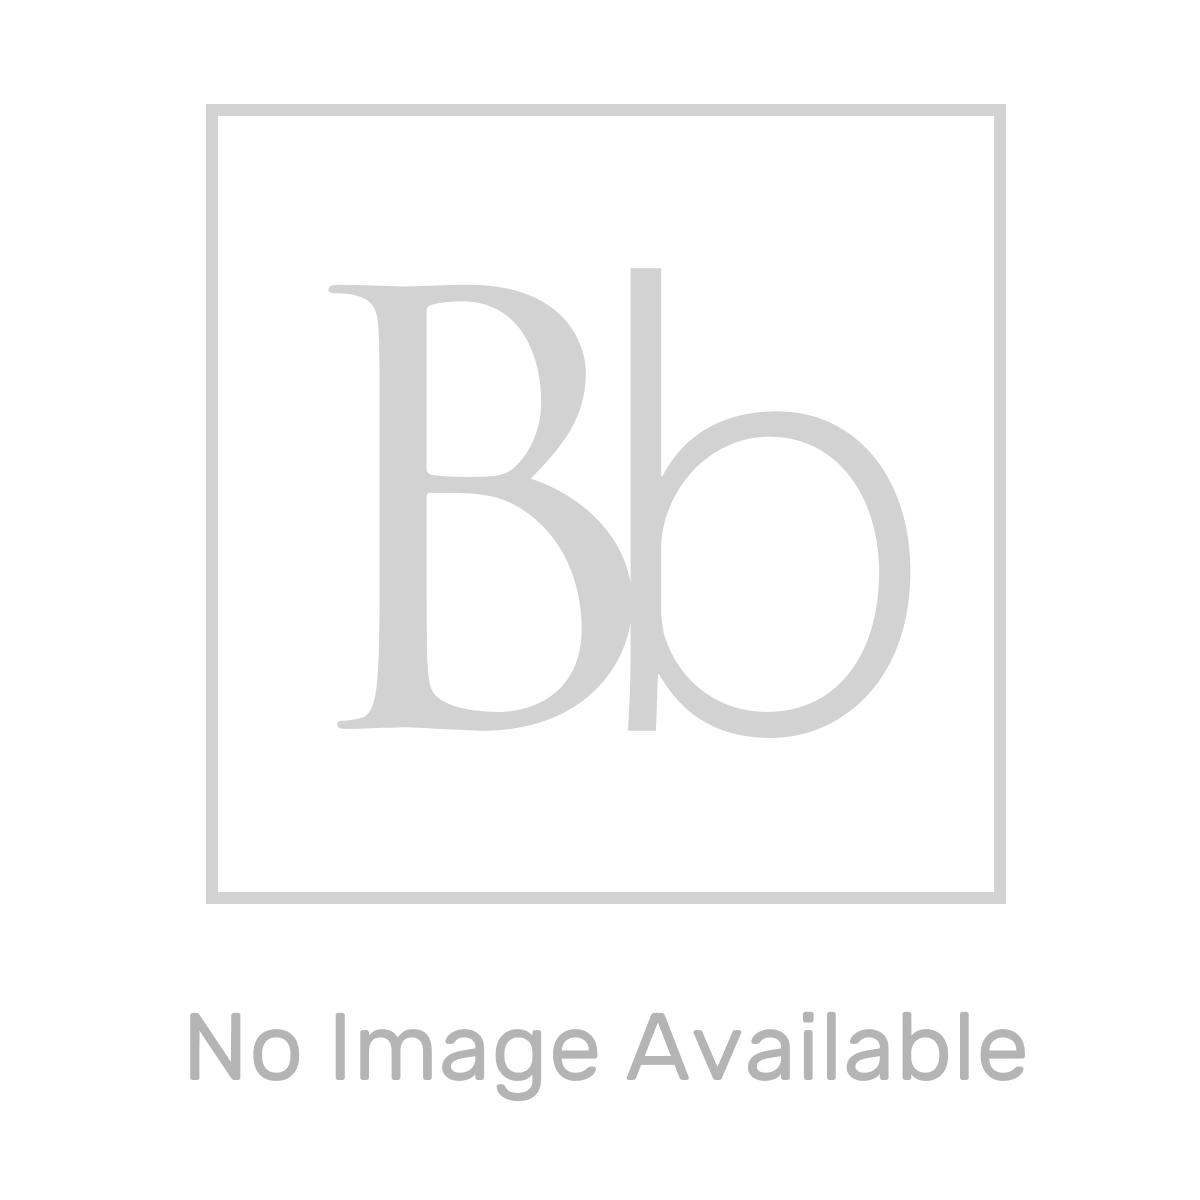 Sanifloor 2 Macerator Pump for Sheet Flooring